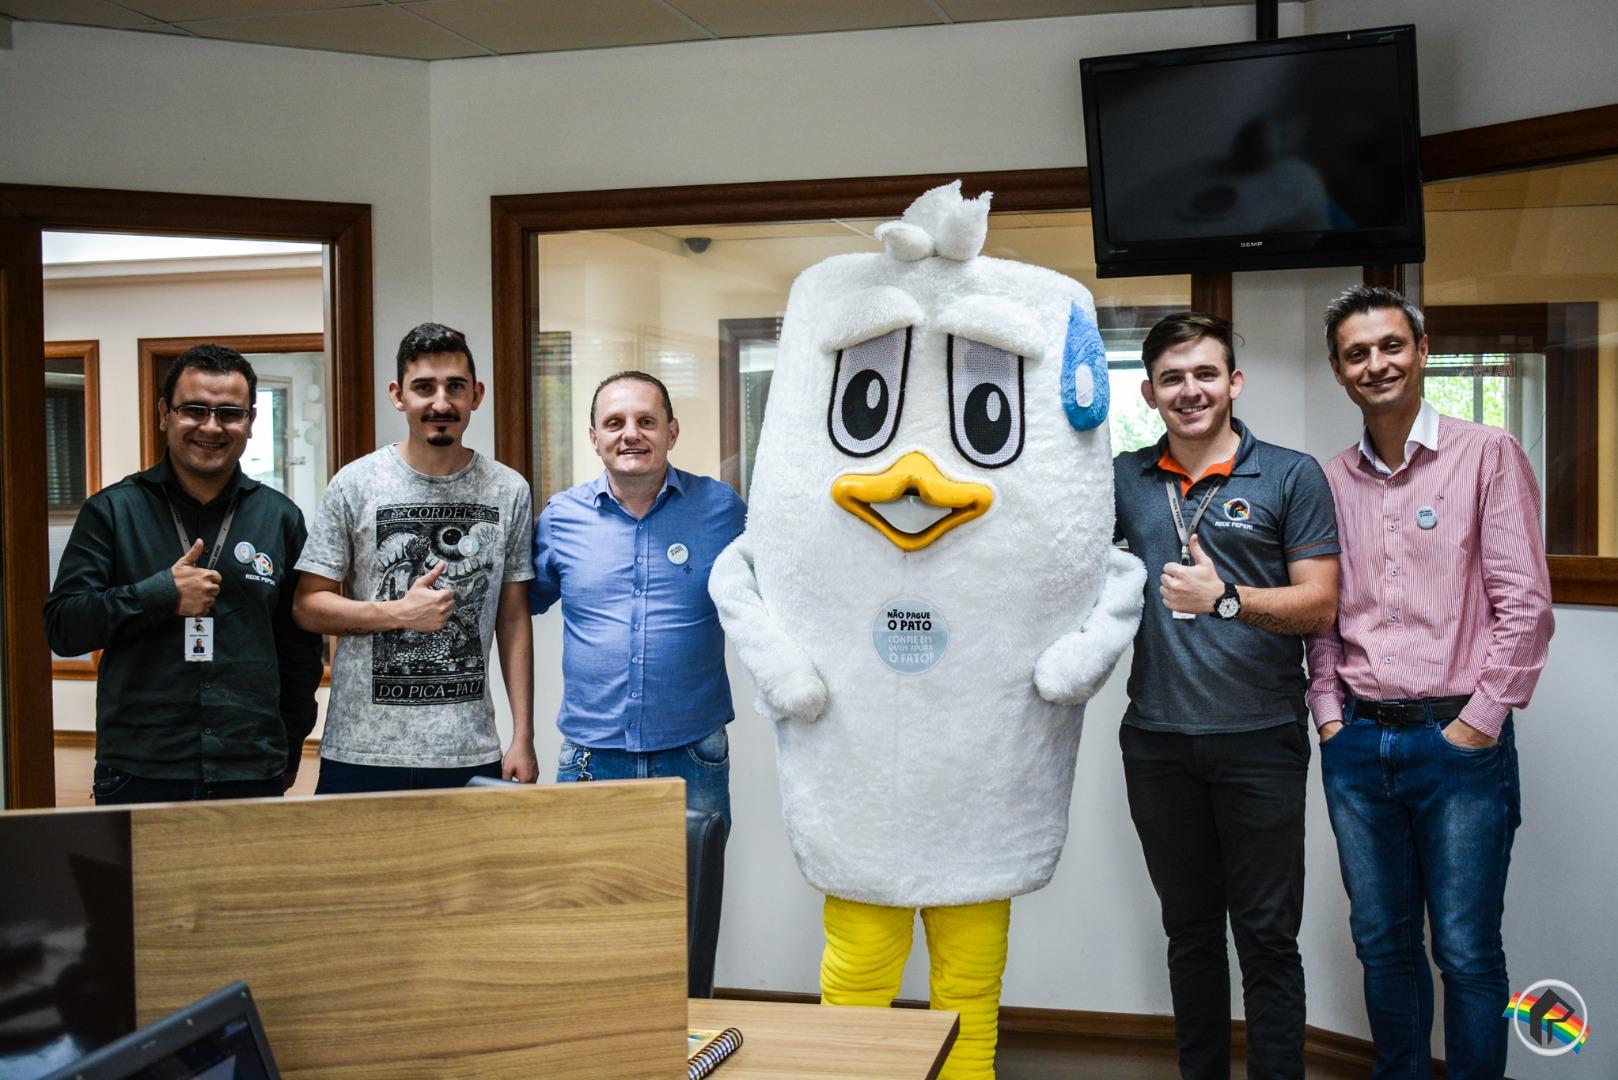 VÍDEO: Mascote Fakelino da ACAERT visita a Rede Peperi